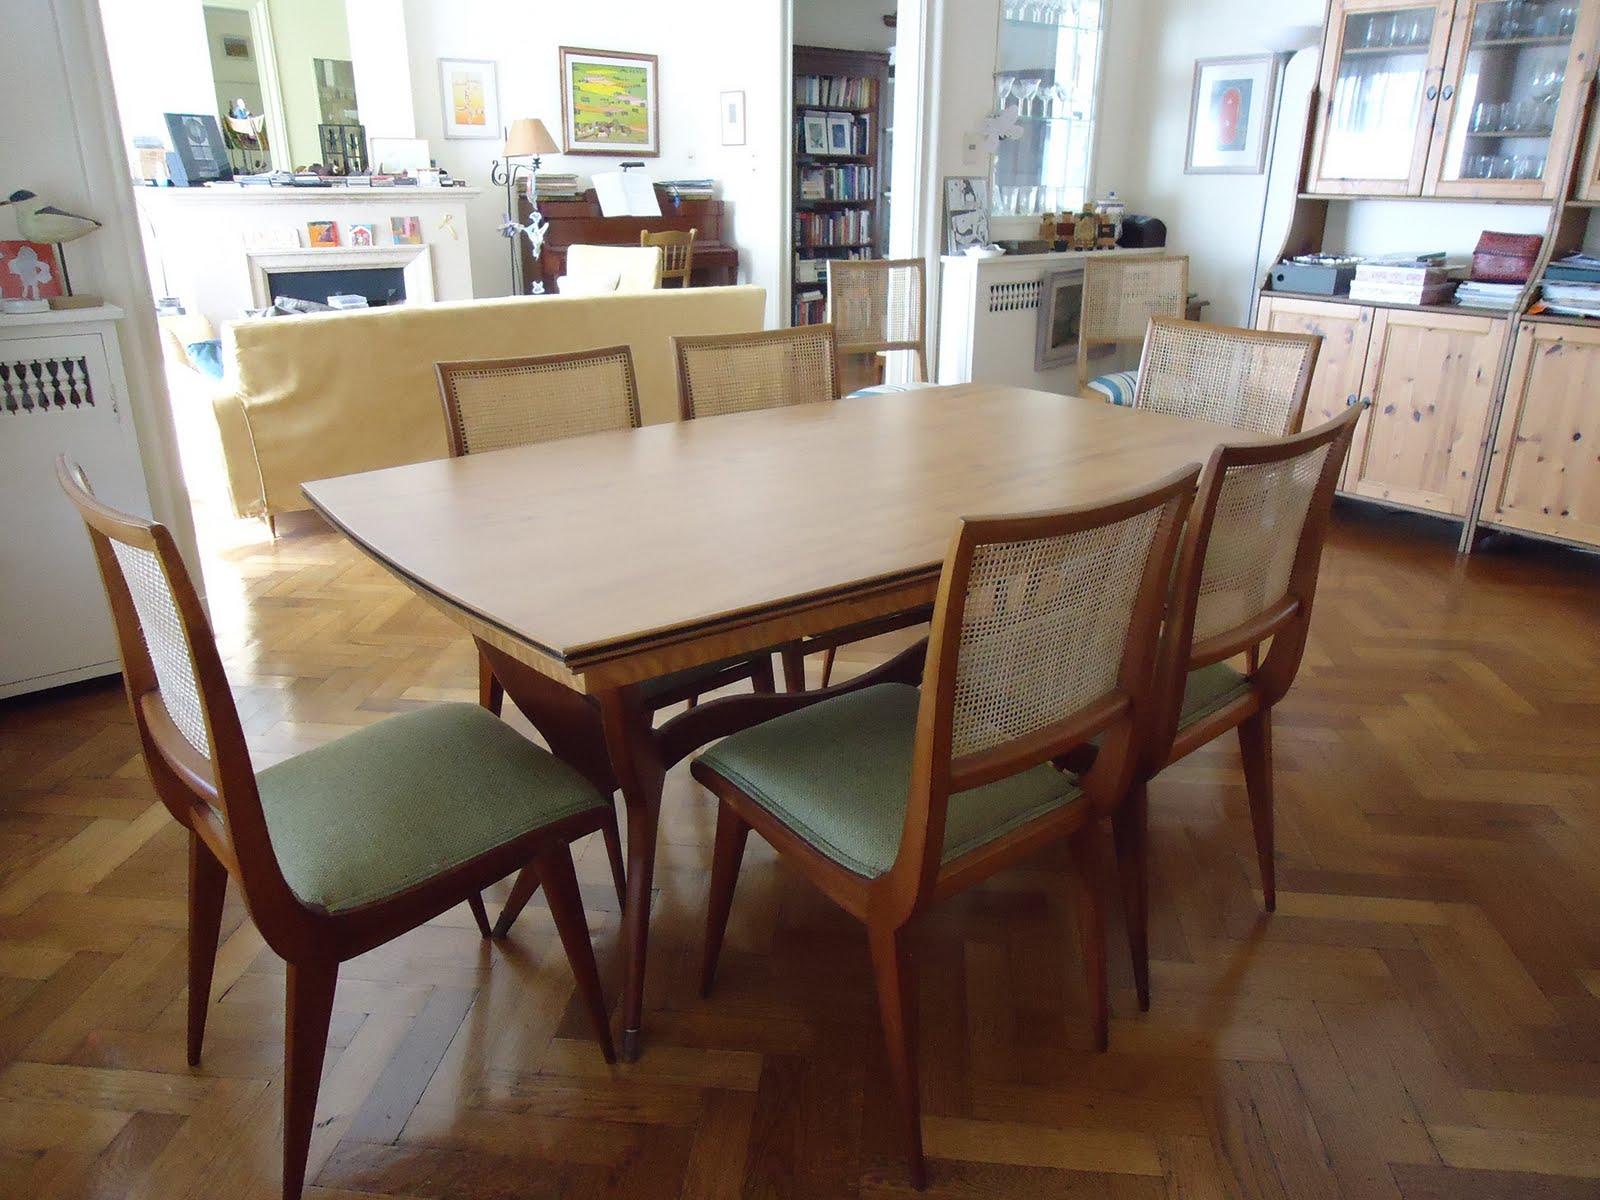 muebles daneses anos 50 dise os arquitect nicos